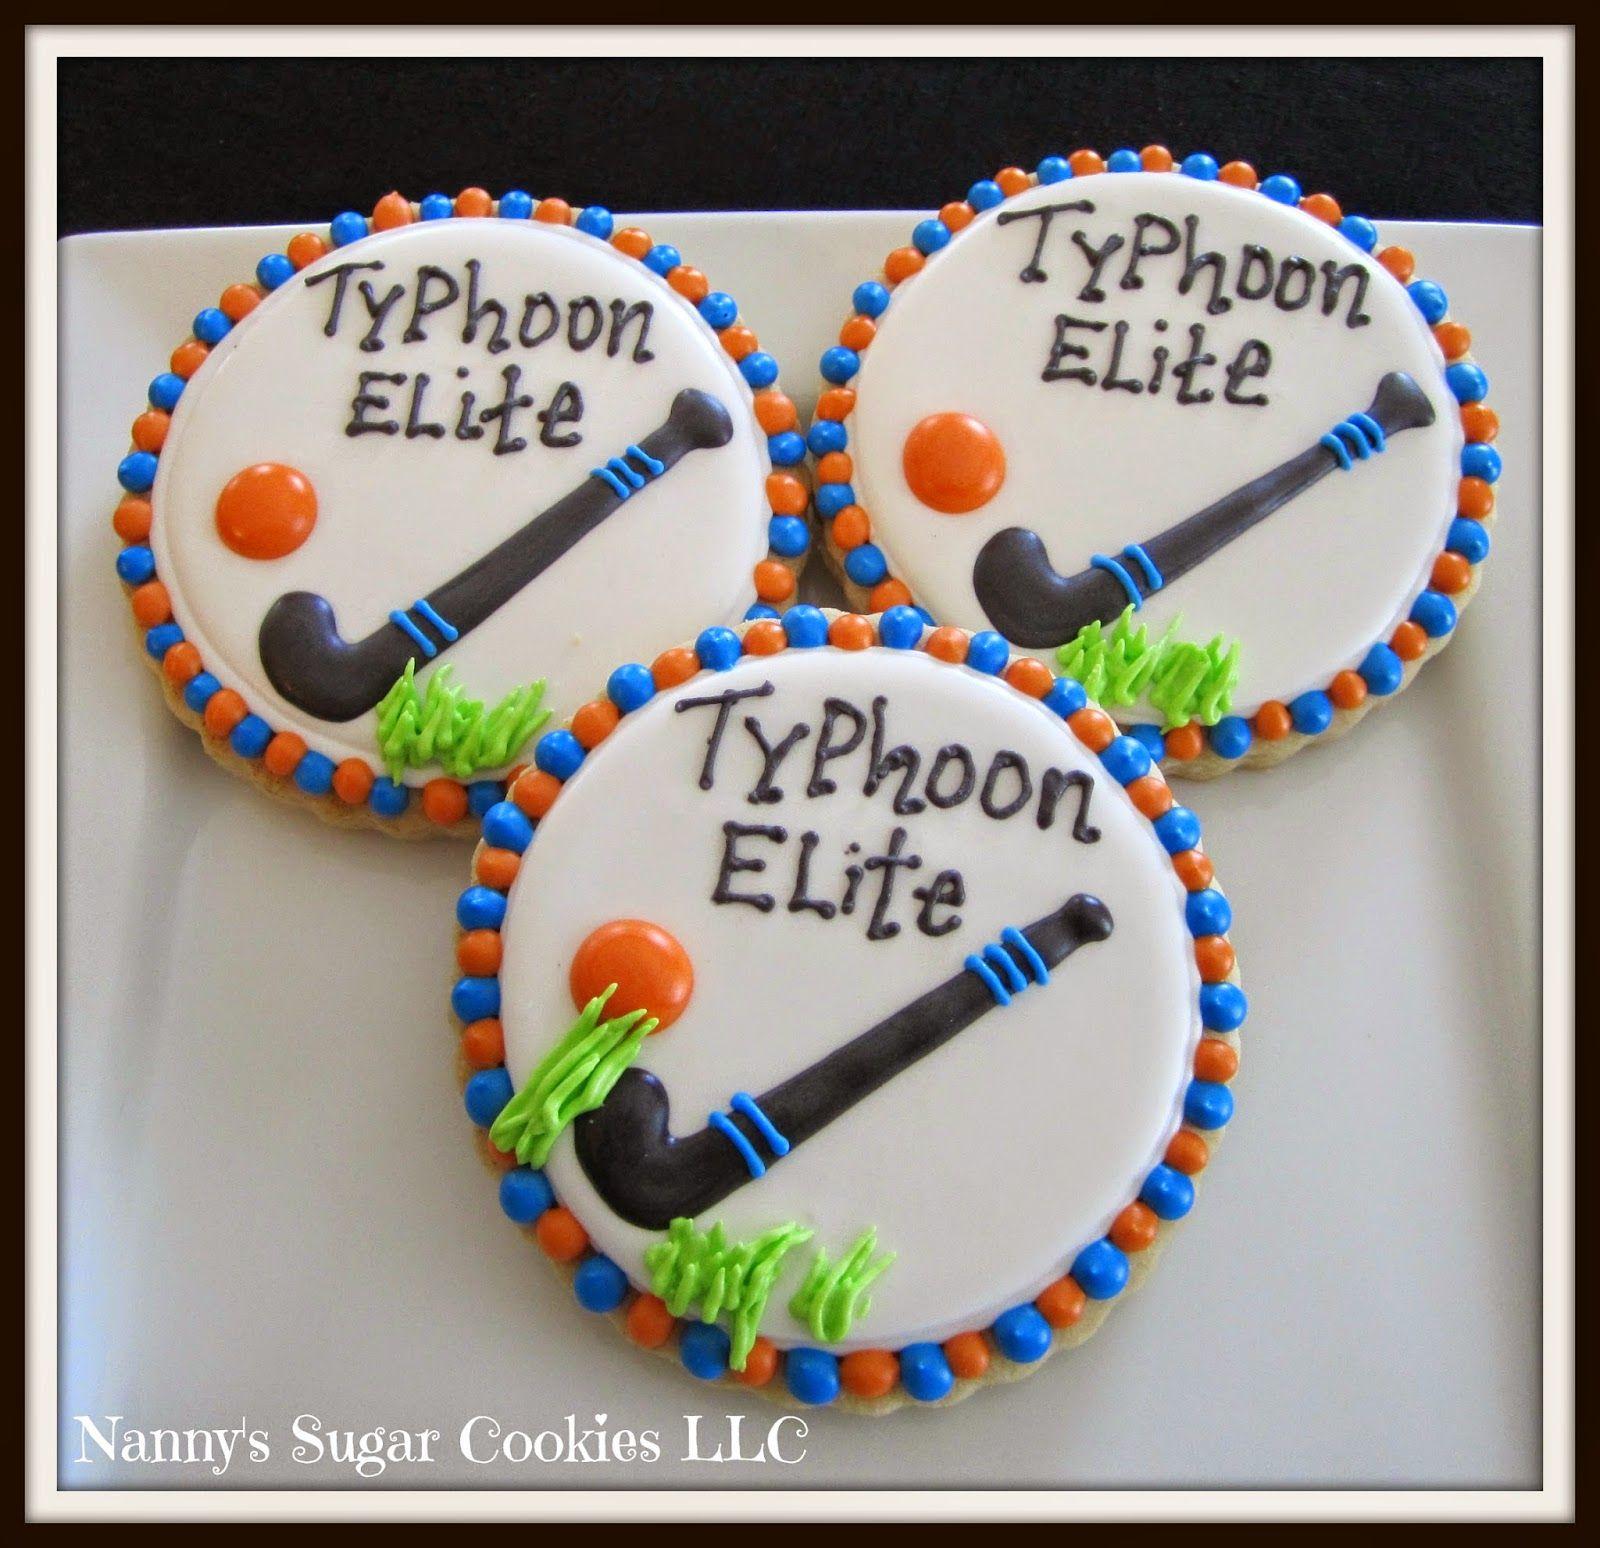 Nanny S Sugar Cookies Llc Cookies For A Field Hockey Team Field Hockey Hockey Birthday Cake Hockey Cakes